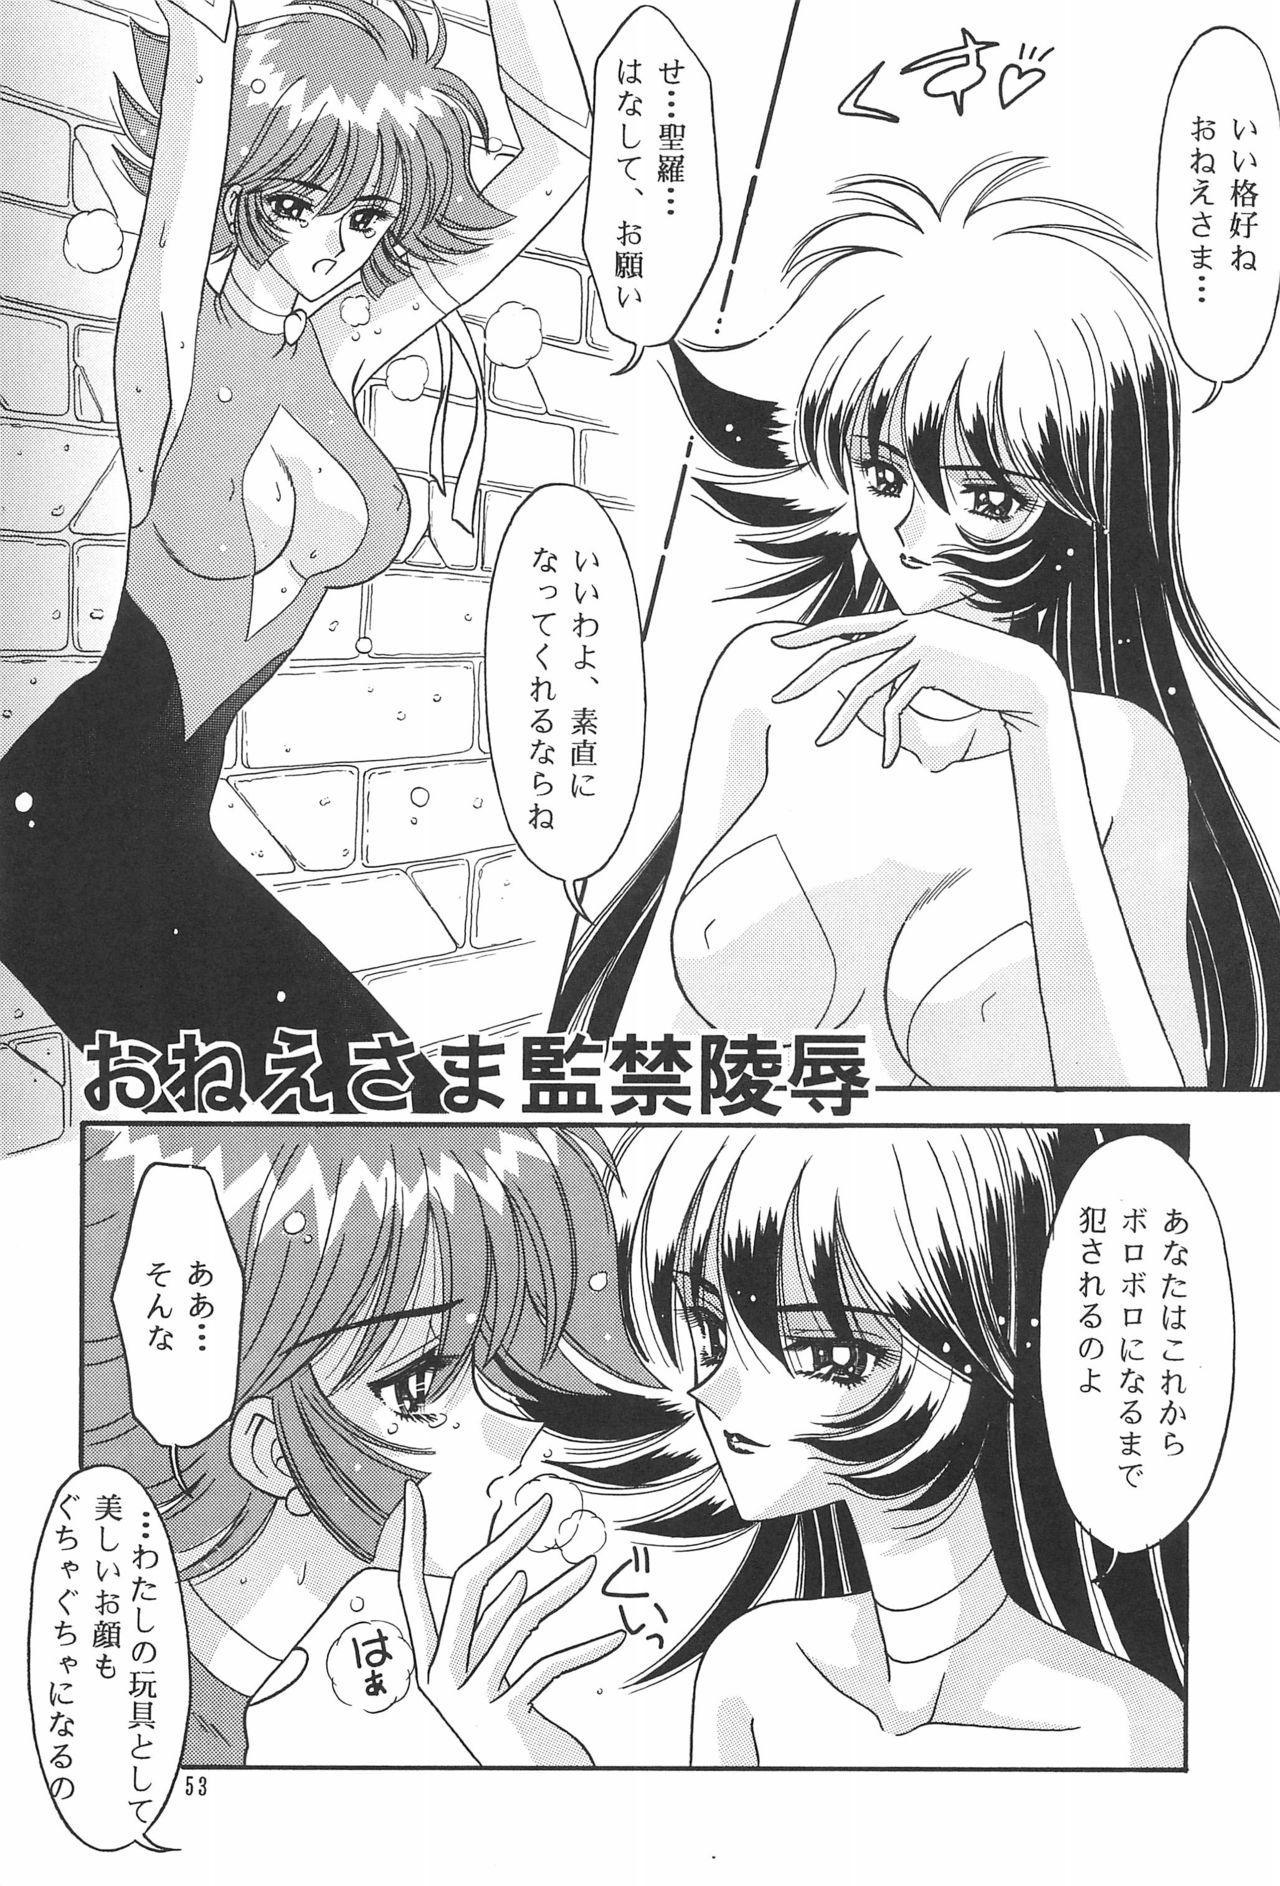 Showbaku 54